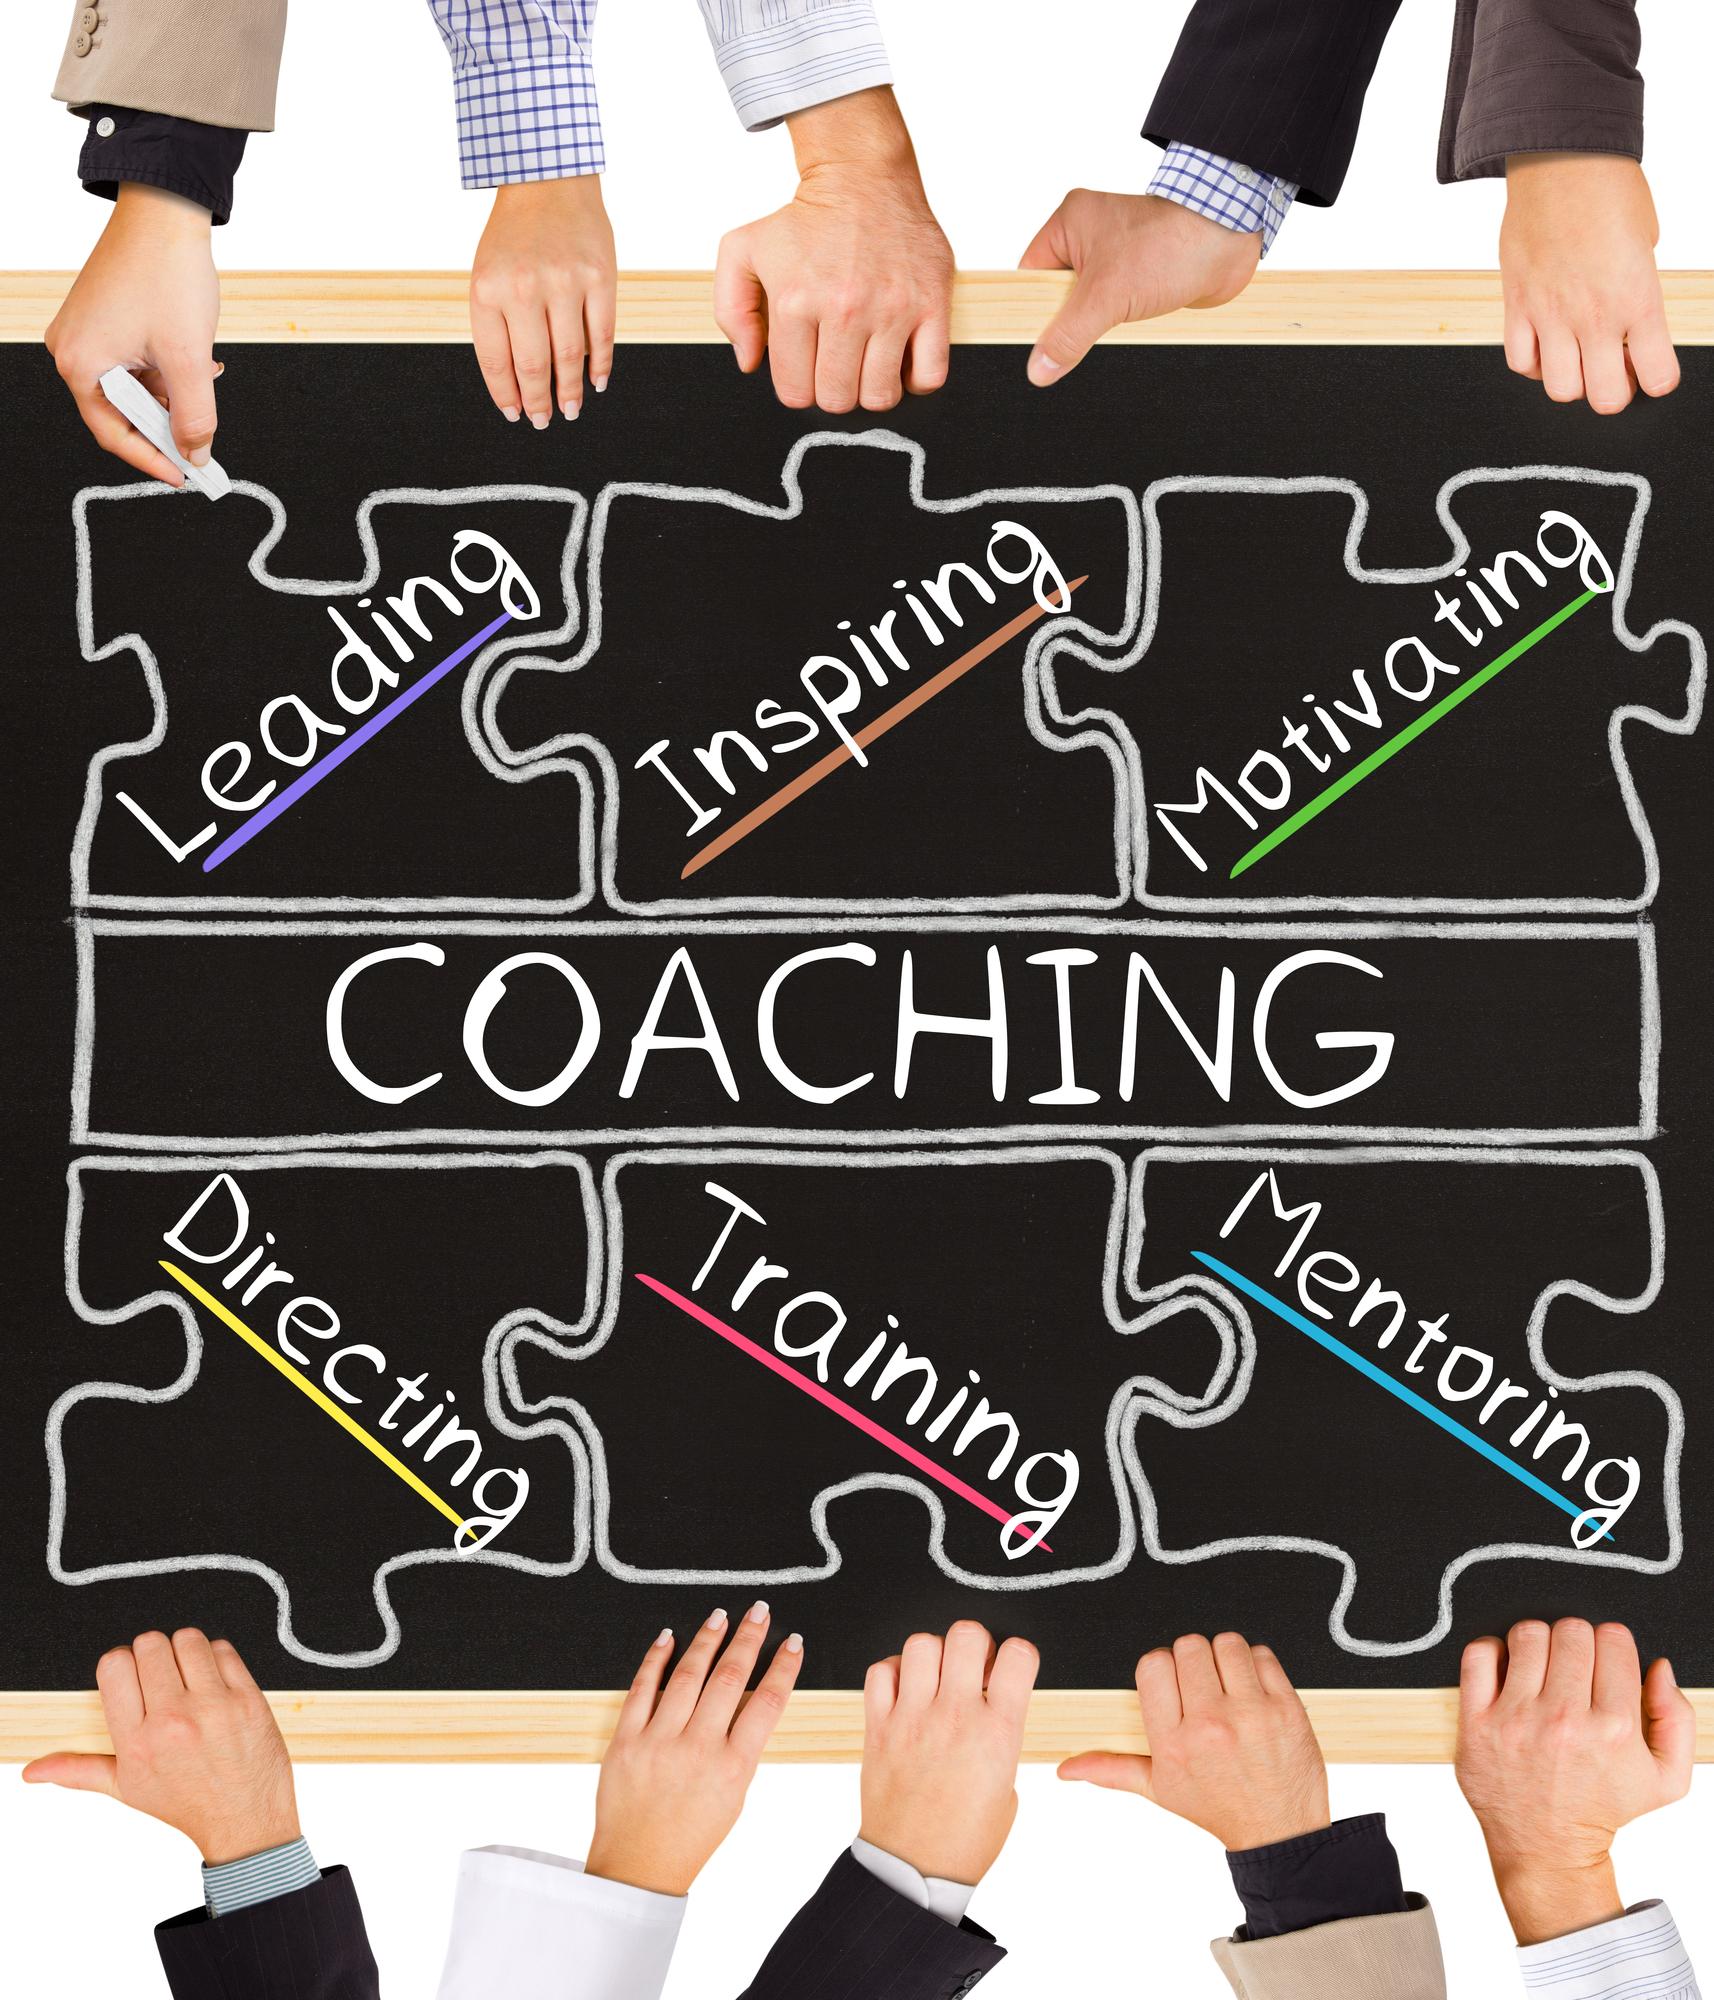 Coaching Mastermind Group Puzzle Solved